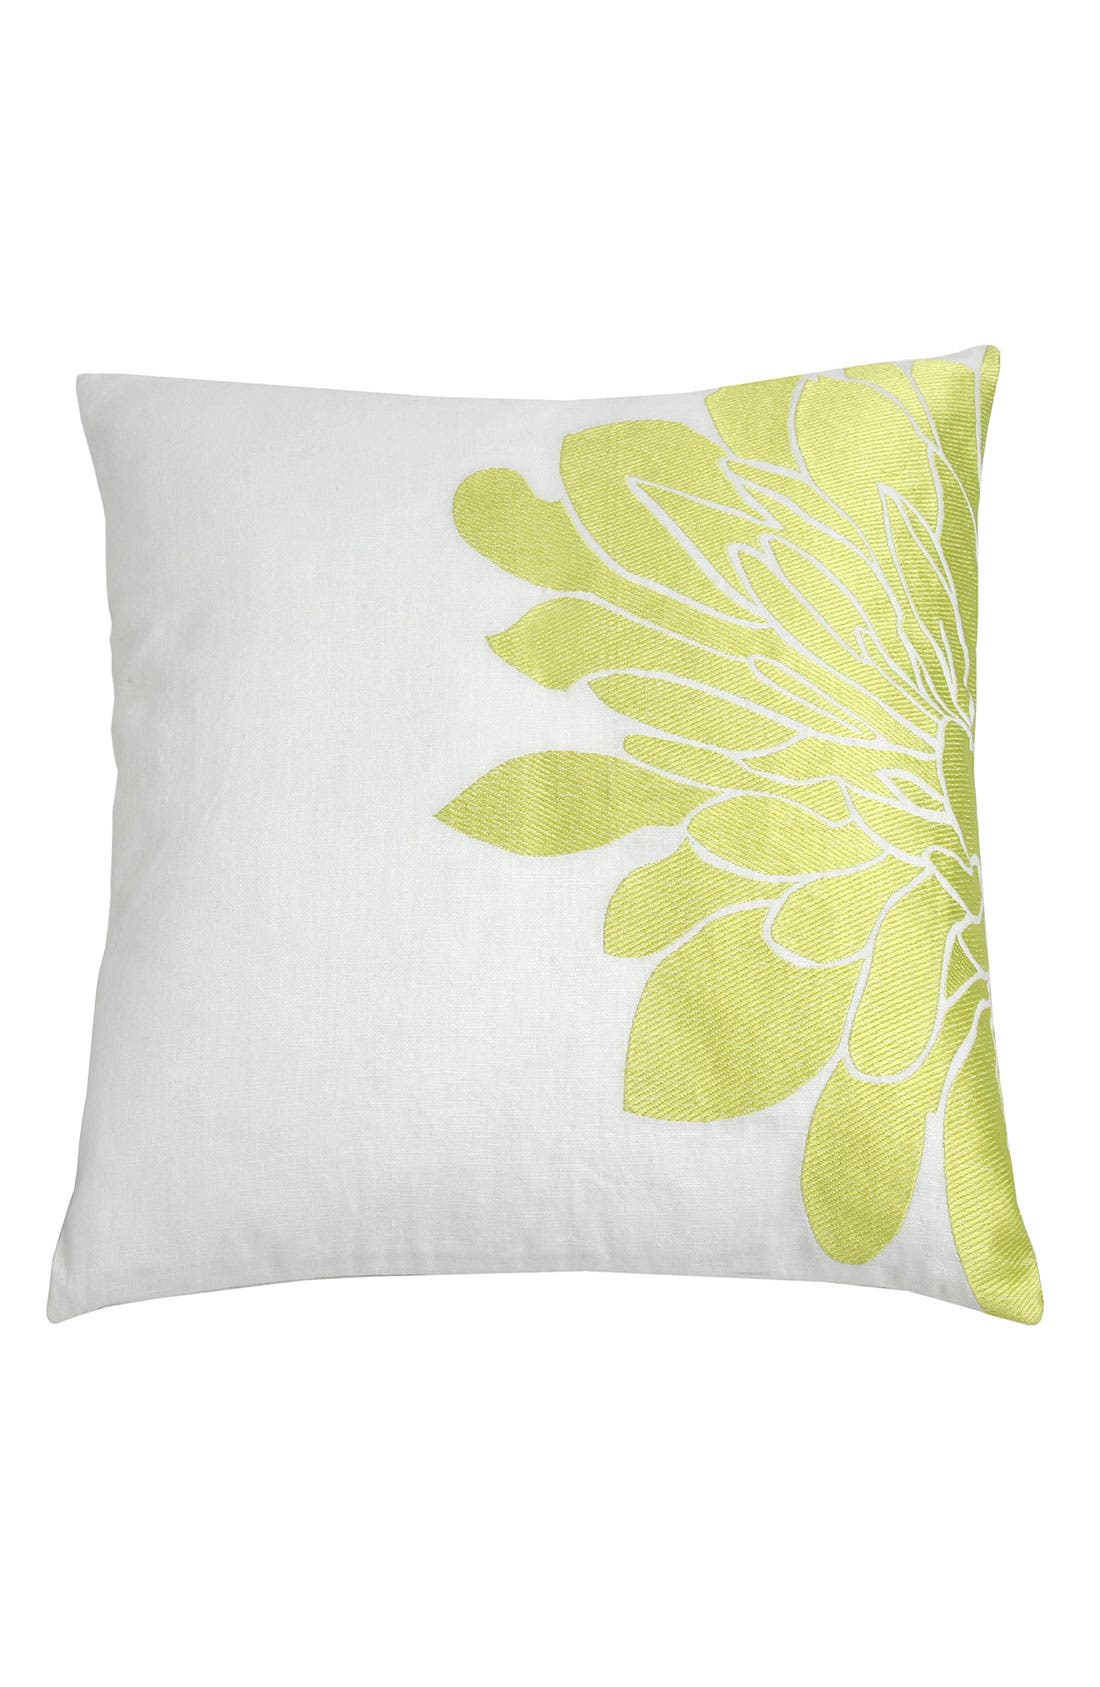 Main Image - Blissliving Home 'Gemini Citron' Pillow (Online Only)